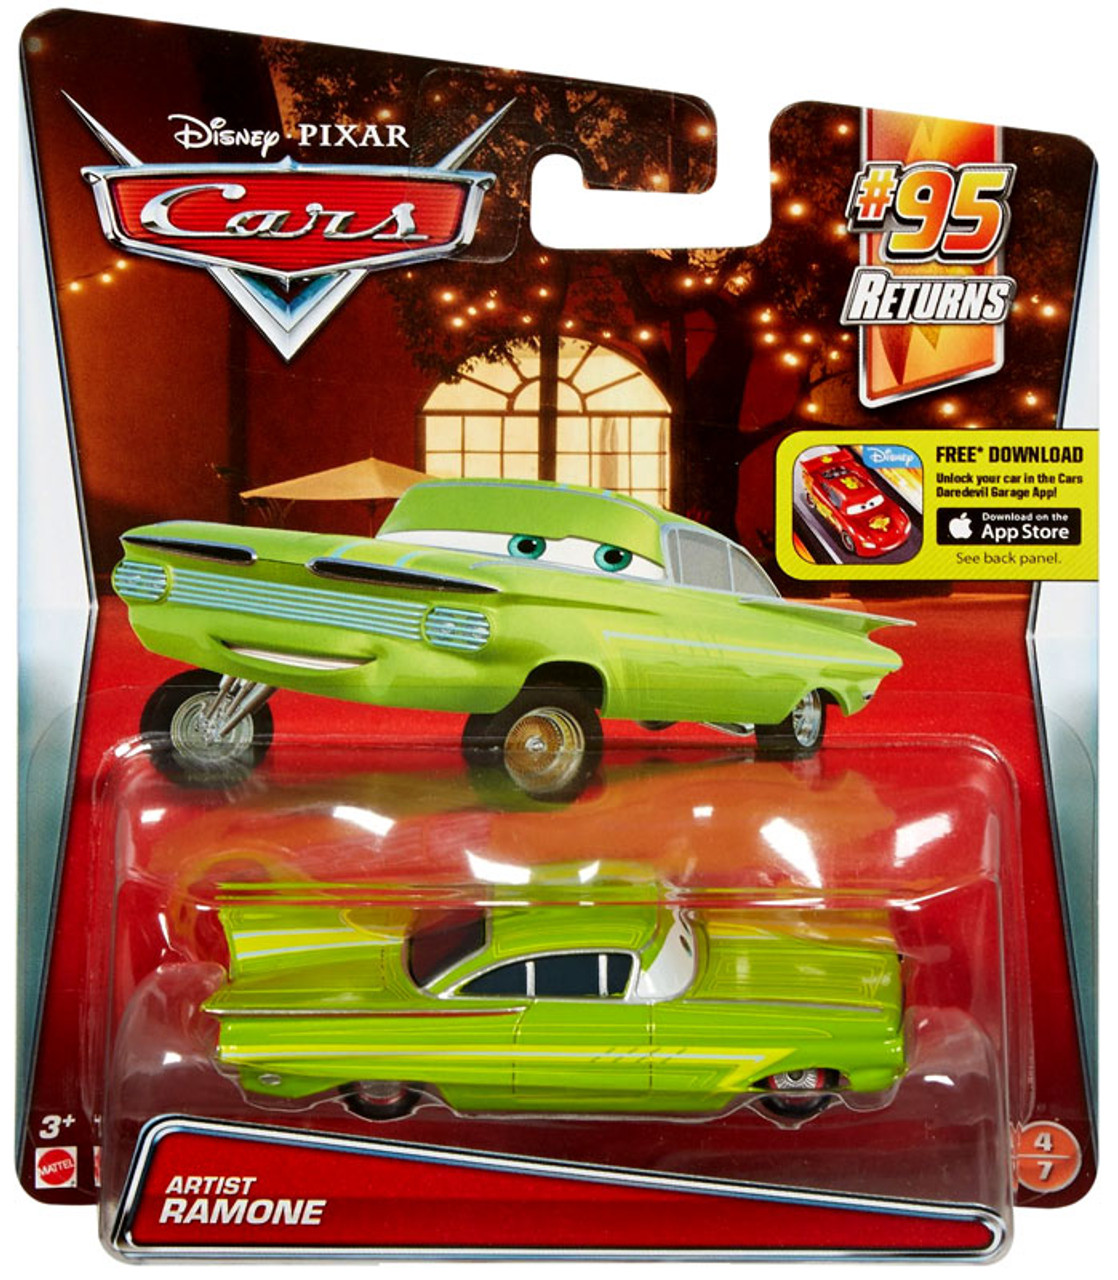 disney pixar cars 95 returns artist ramone 155 diecast car 47 mattel toys toywiz. Black Bedroom Furniture Sets. Home Design Ideas